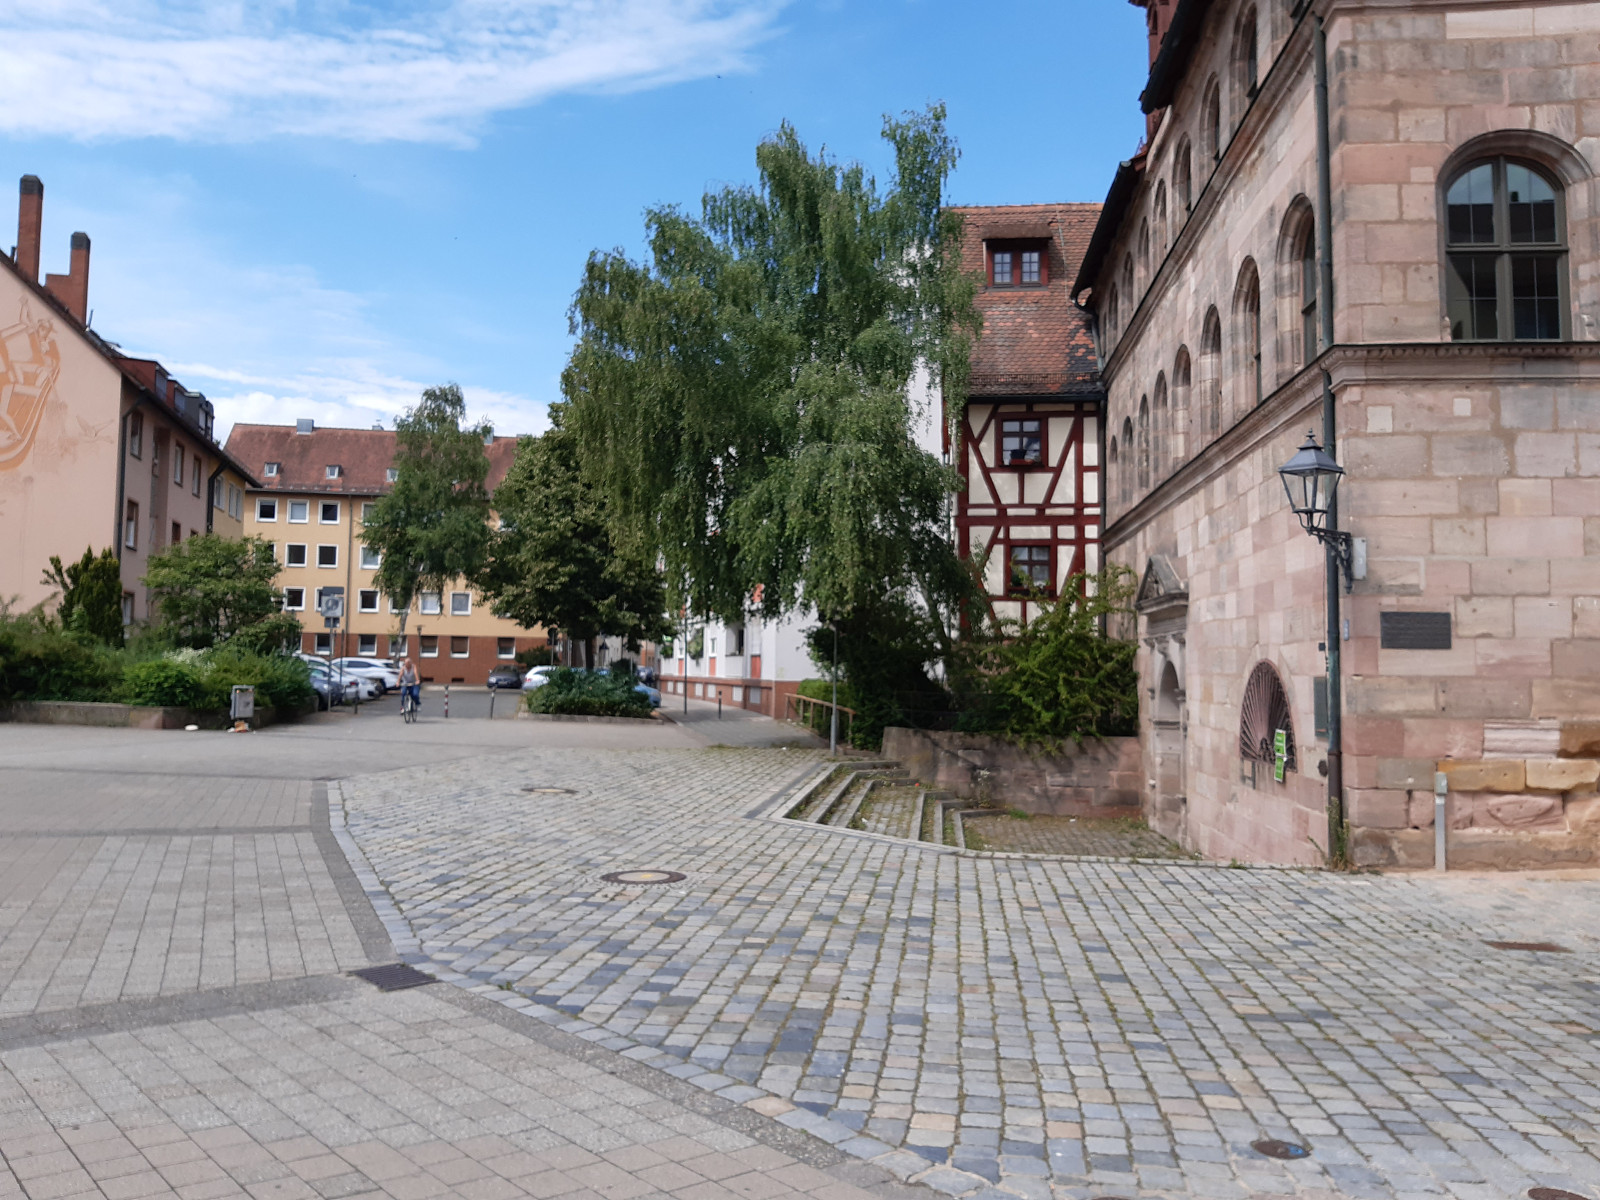 2021-09-07-03-50-16-5Herrenschiesshaus_AndrejSacharowplatz.jpg - Atelier Haberbosch Nürnberg